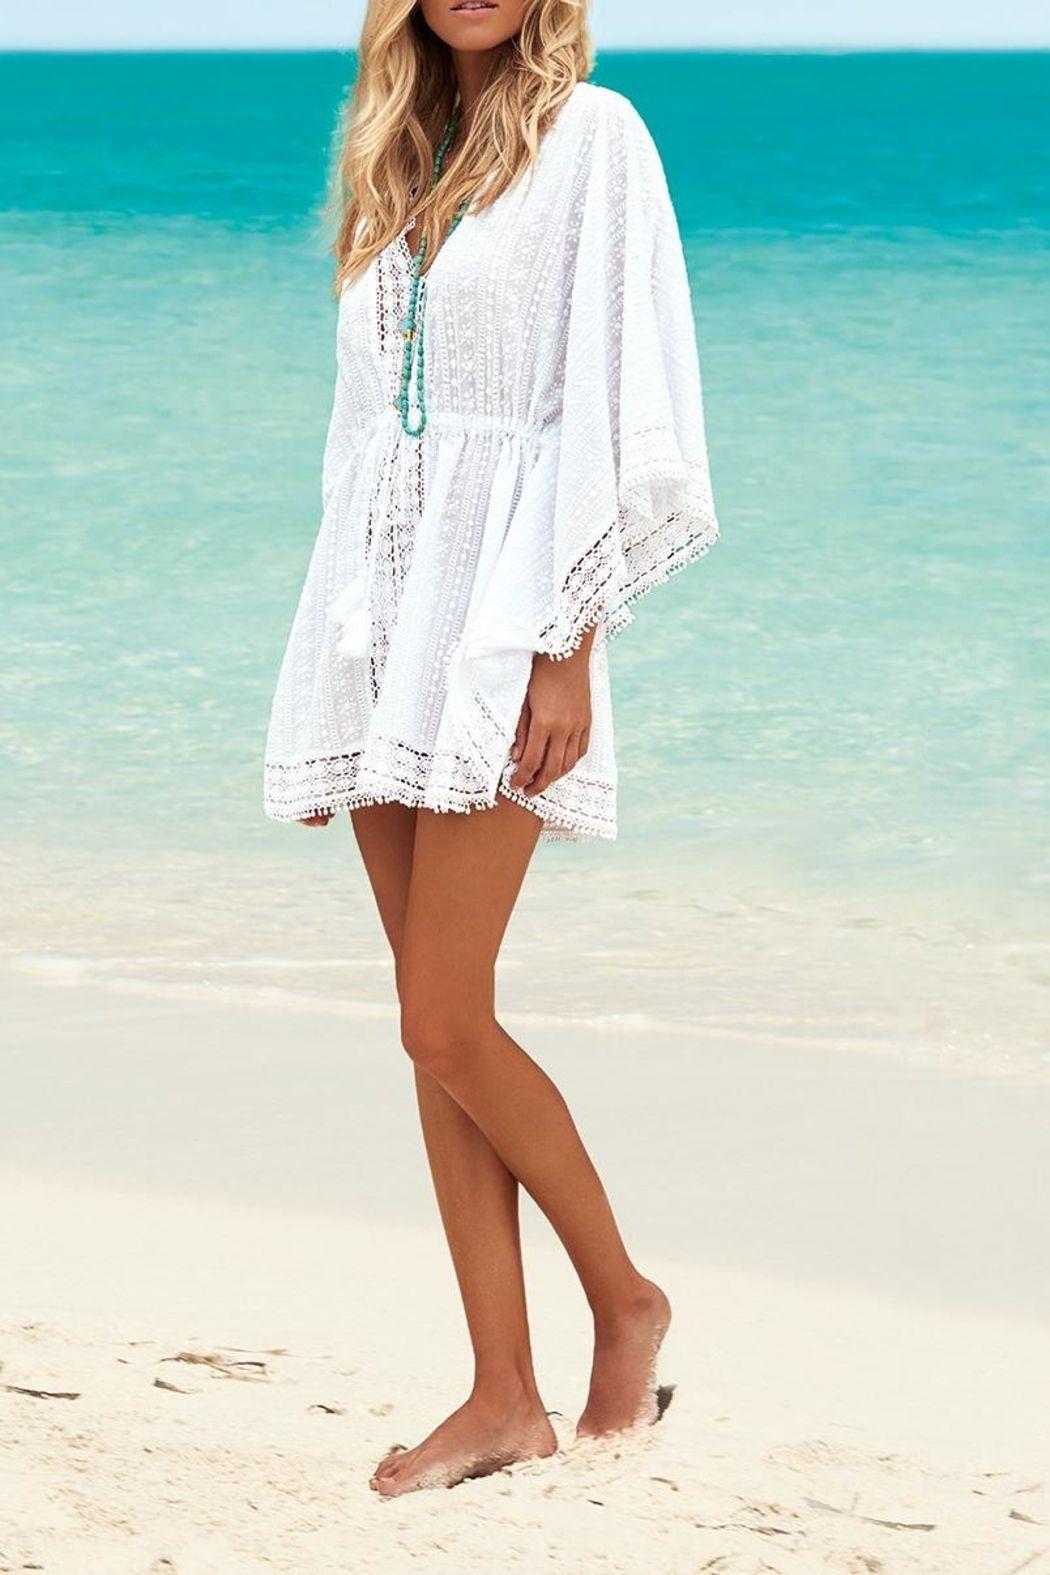 f6cc12db1a6d6 Melissa Odabash Gigi Short Kaftan - Main Image Beach Kaftan, Beach Cafe,  Barefoot Beach